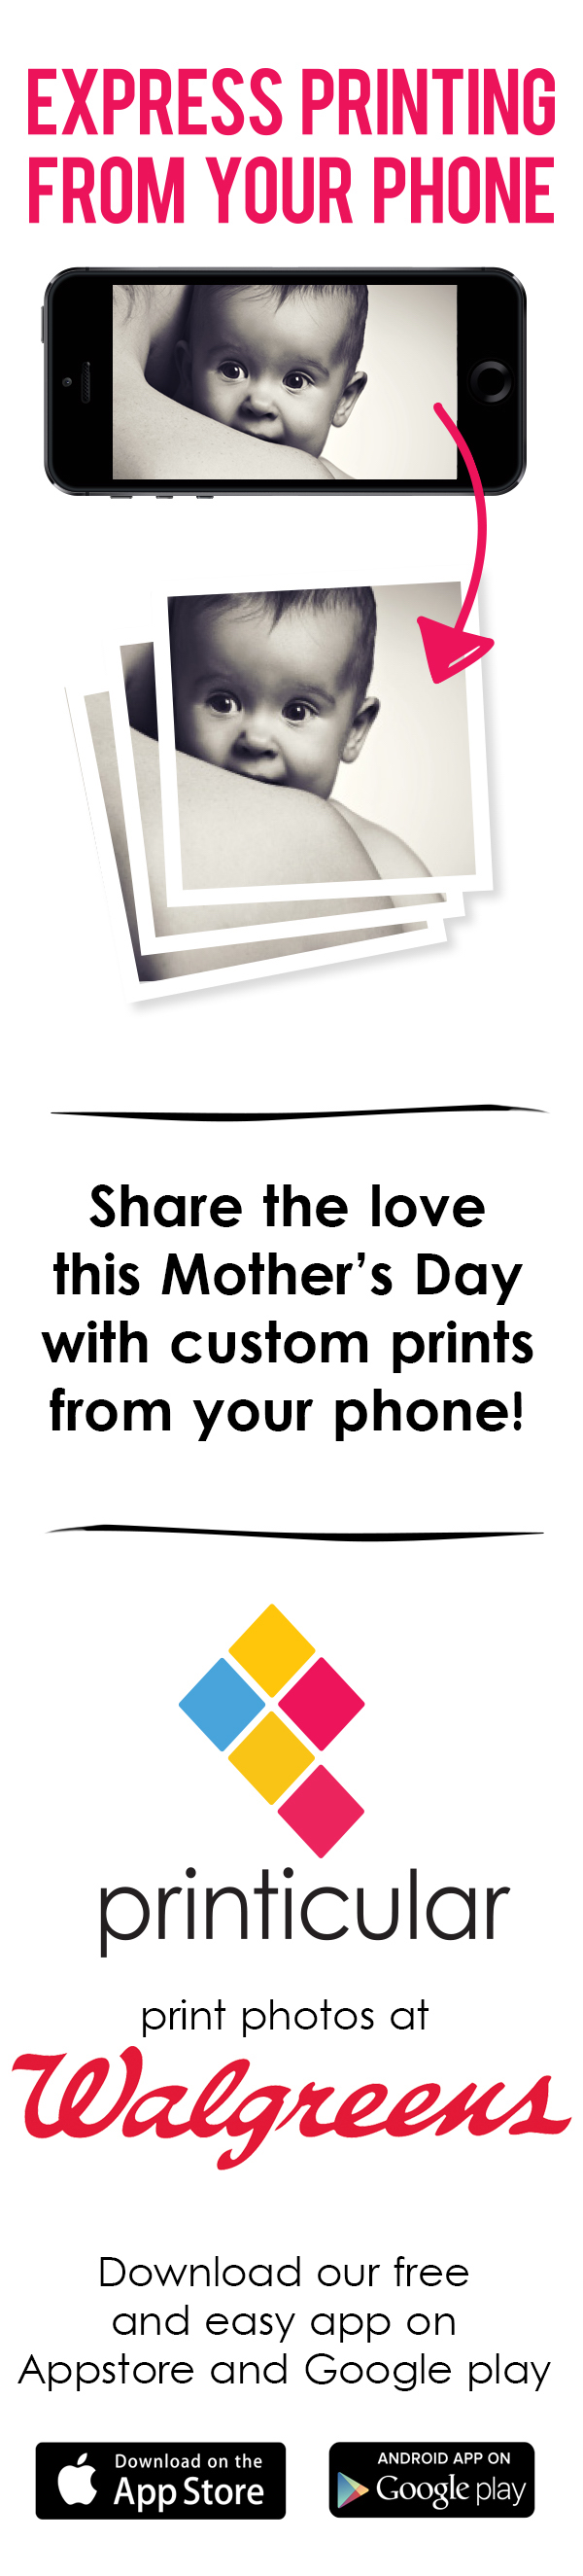 Mommy's Favorite App Photo printing, Walgreens photo, Prints